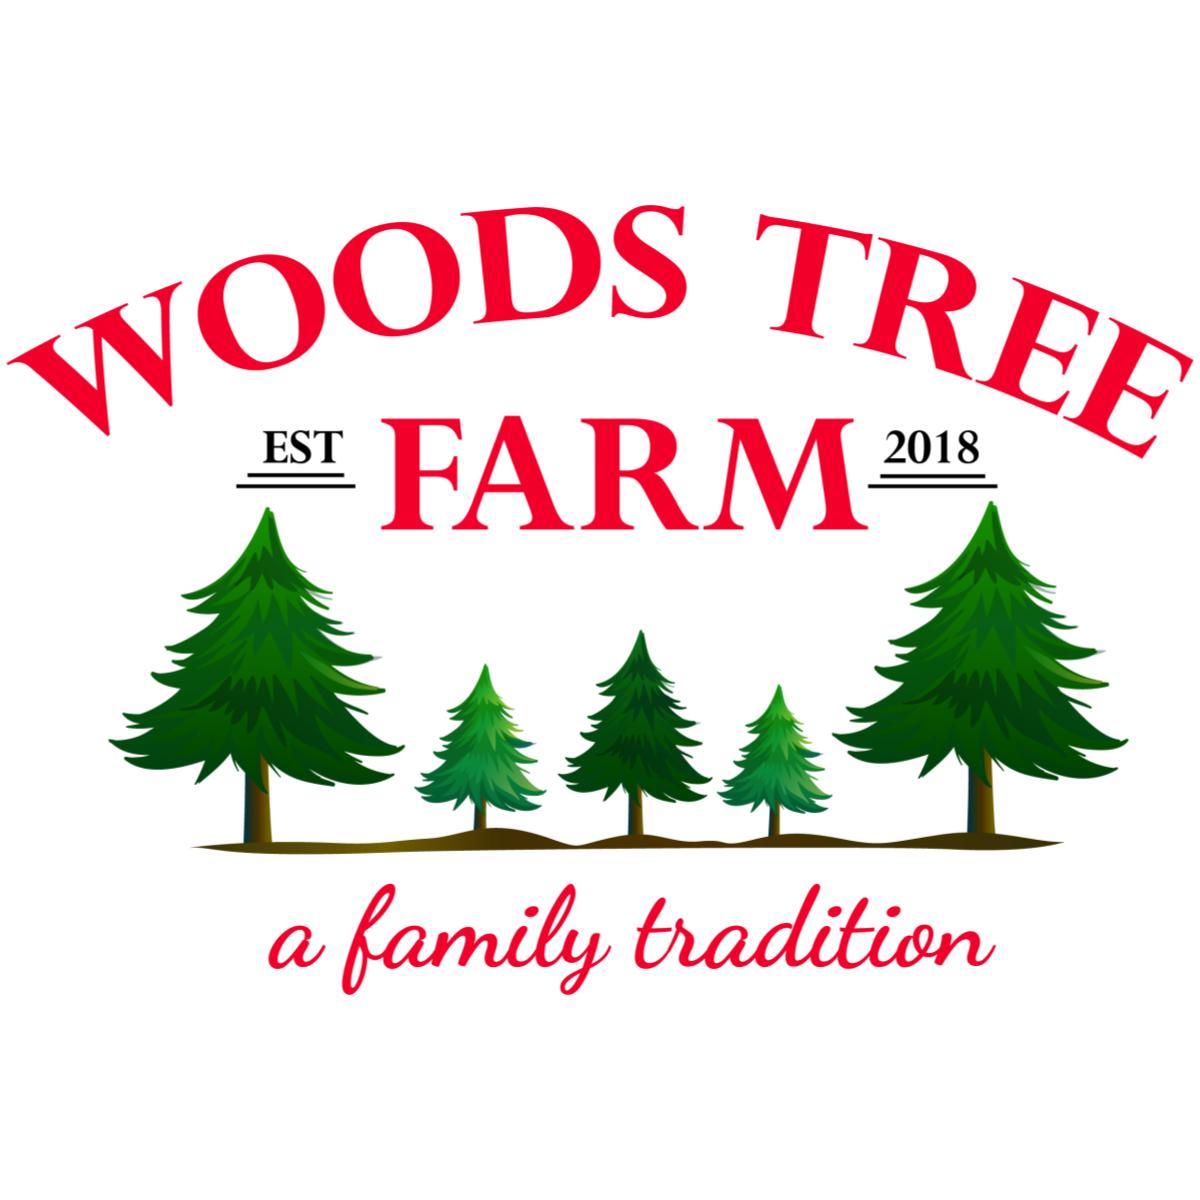 Christmas Tree Farm Logo.Woods Tree Farm Woods Tree Farm